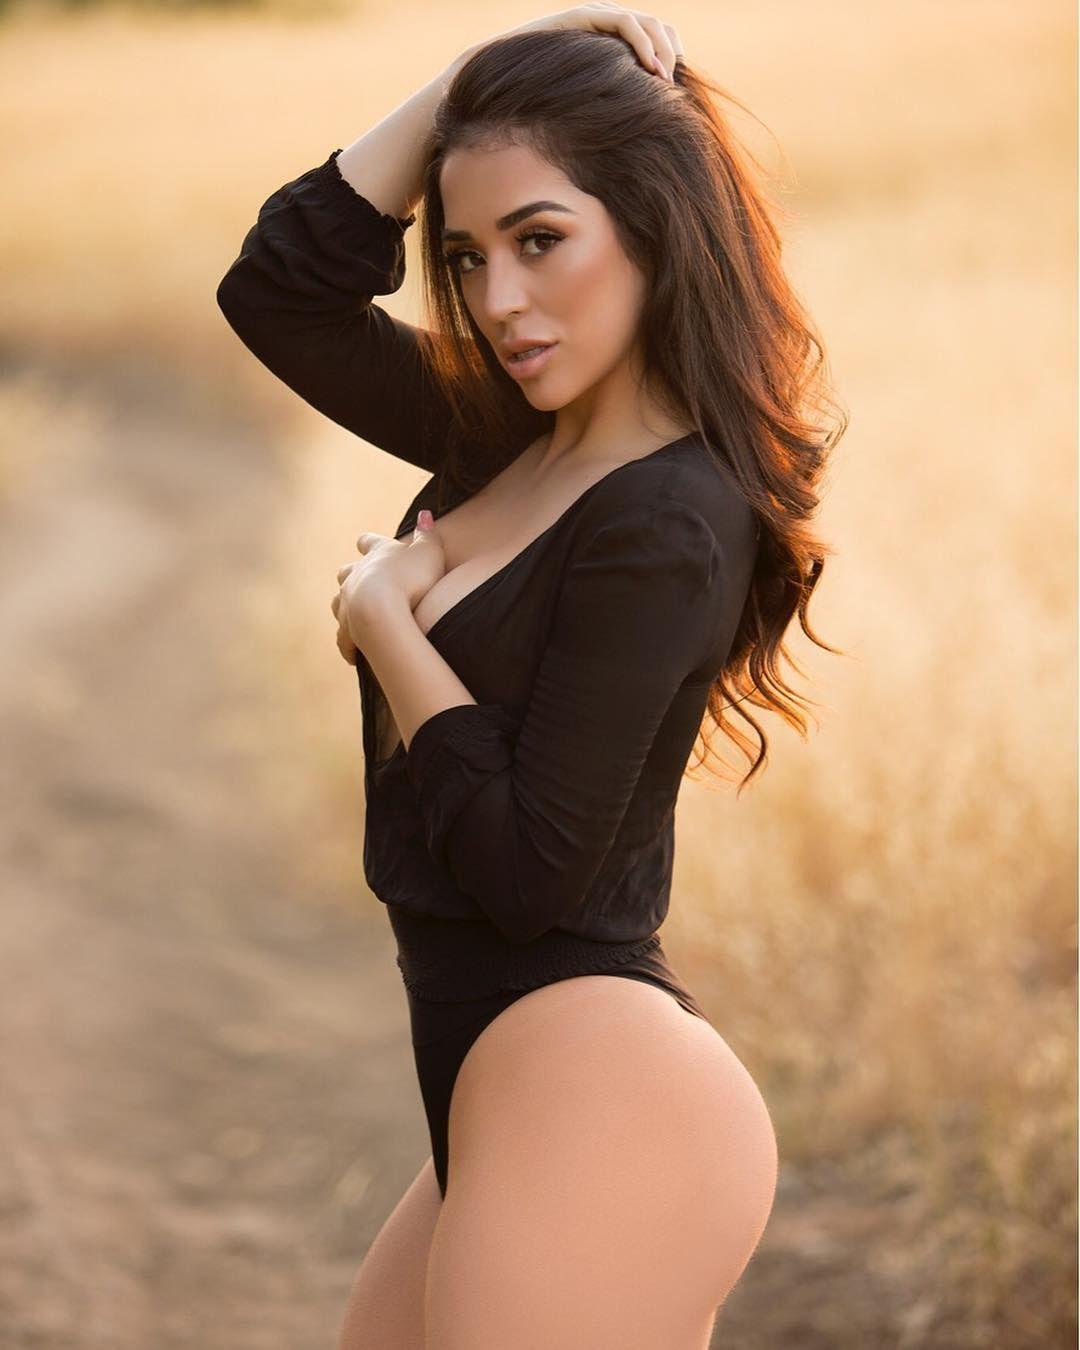 Jacky Romero F0 9f 8c B9 Gorgeous Latina Model On Instagram Iamjaqueline In Sensual Black Bodysuit At Malibu California United States Of America